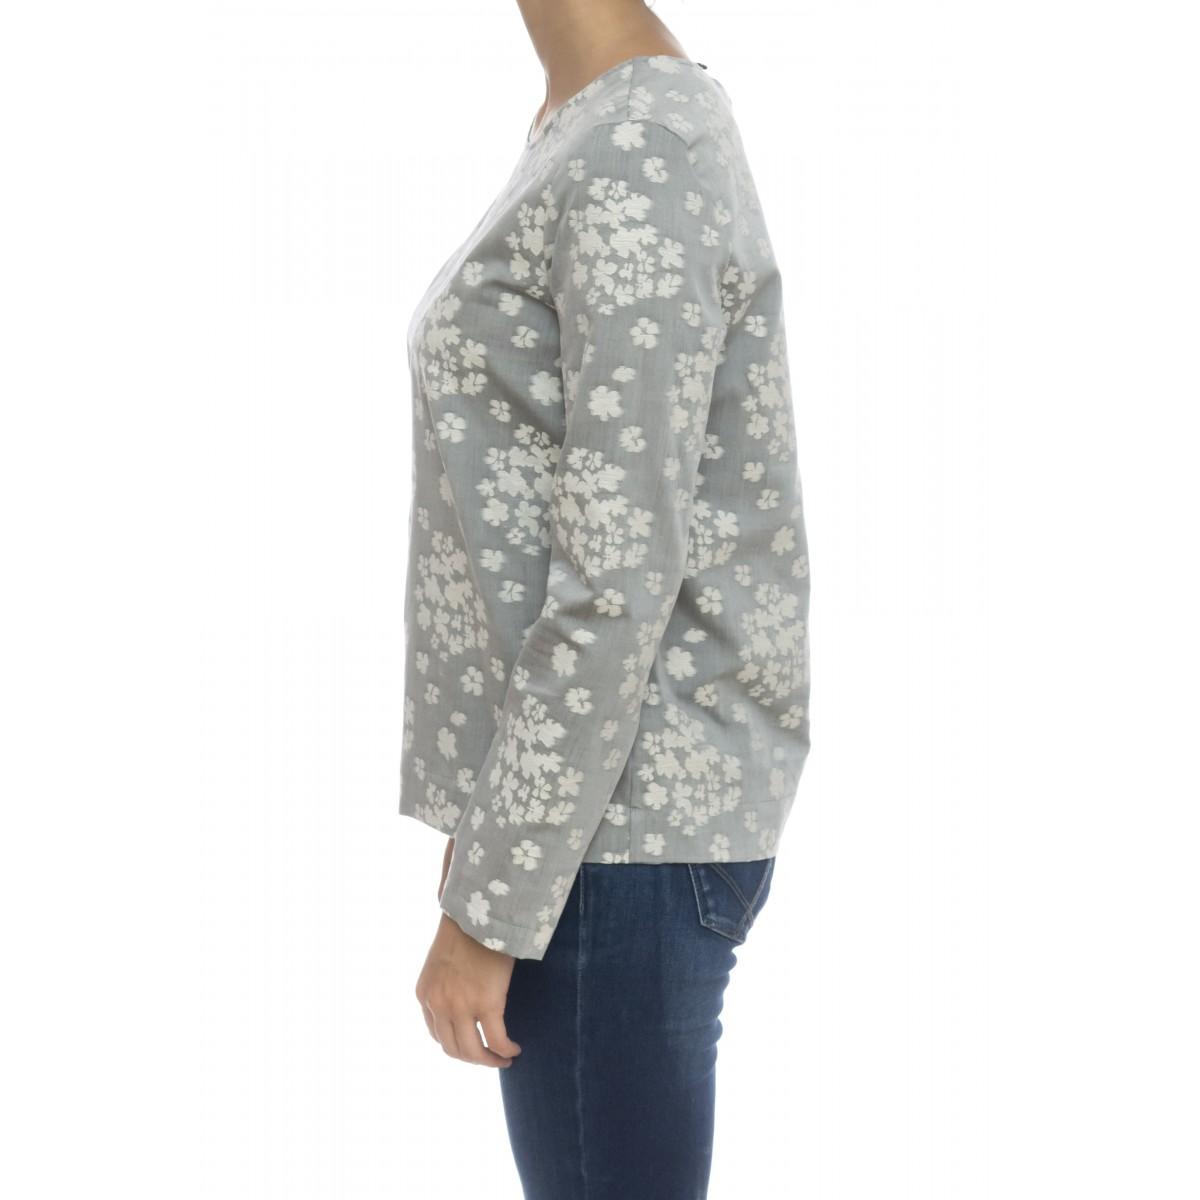 Camicia donna - 5301 55401 jaquard bicotone